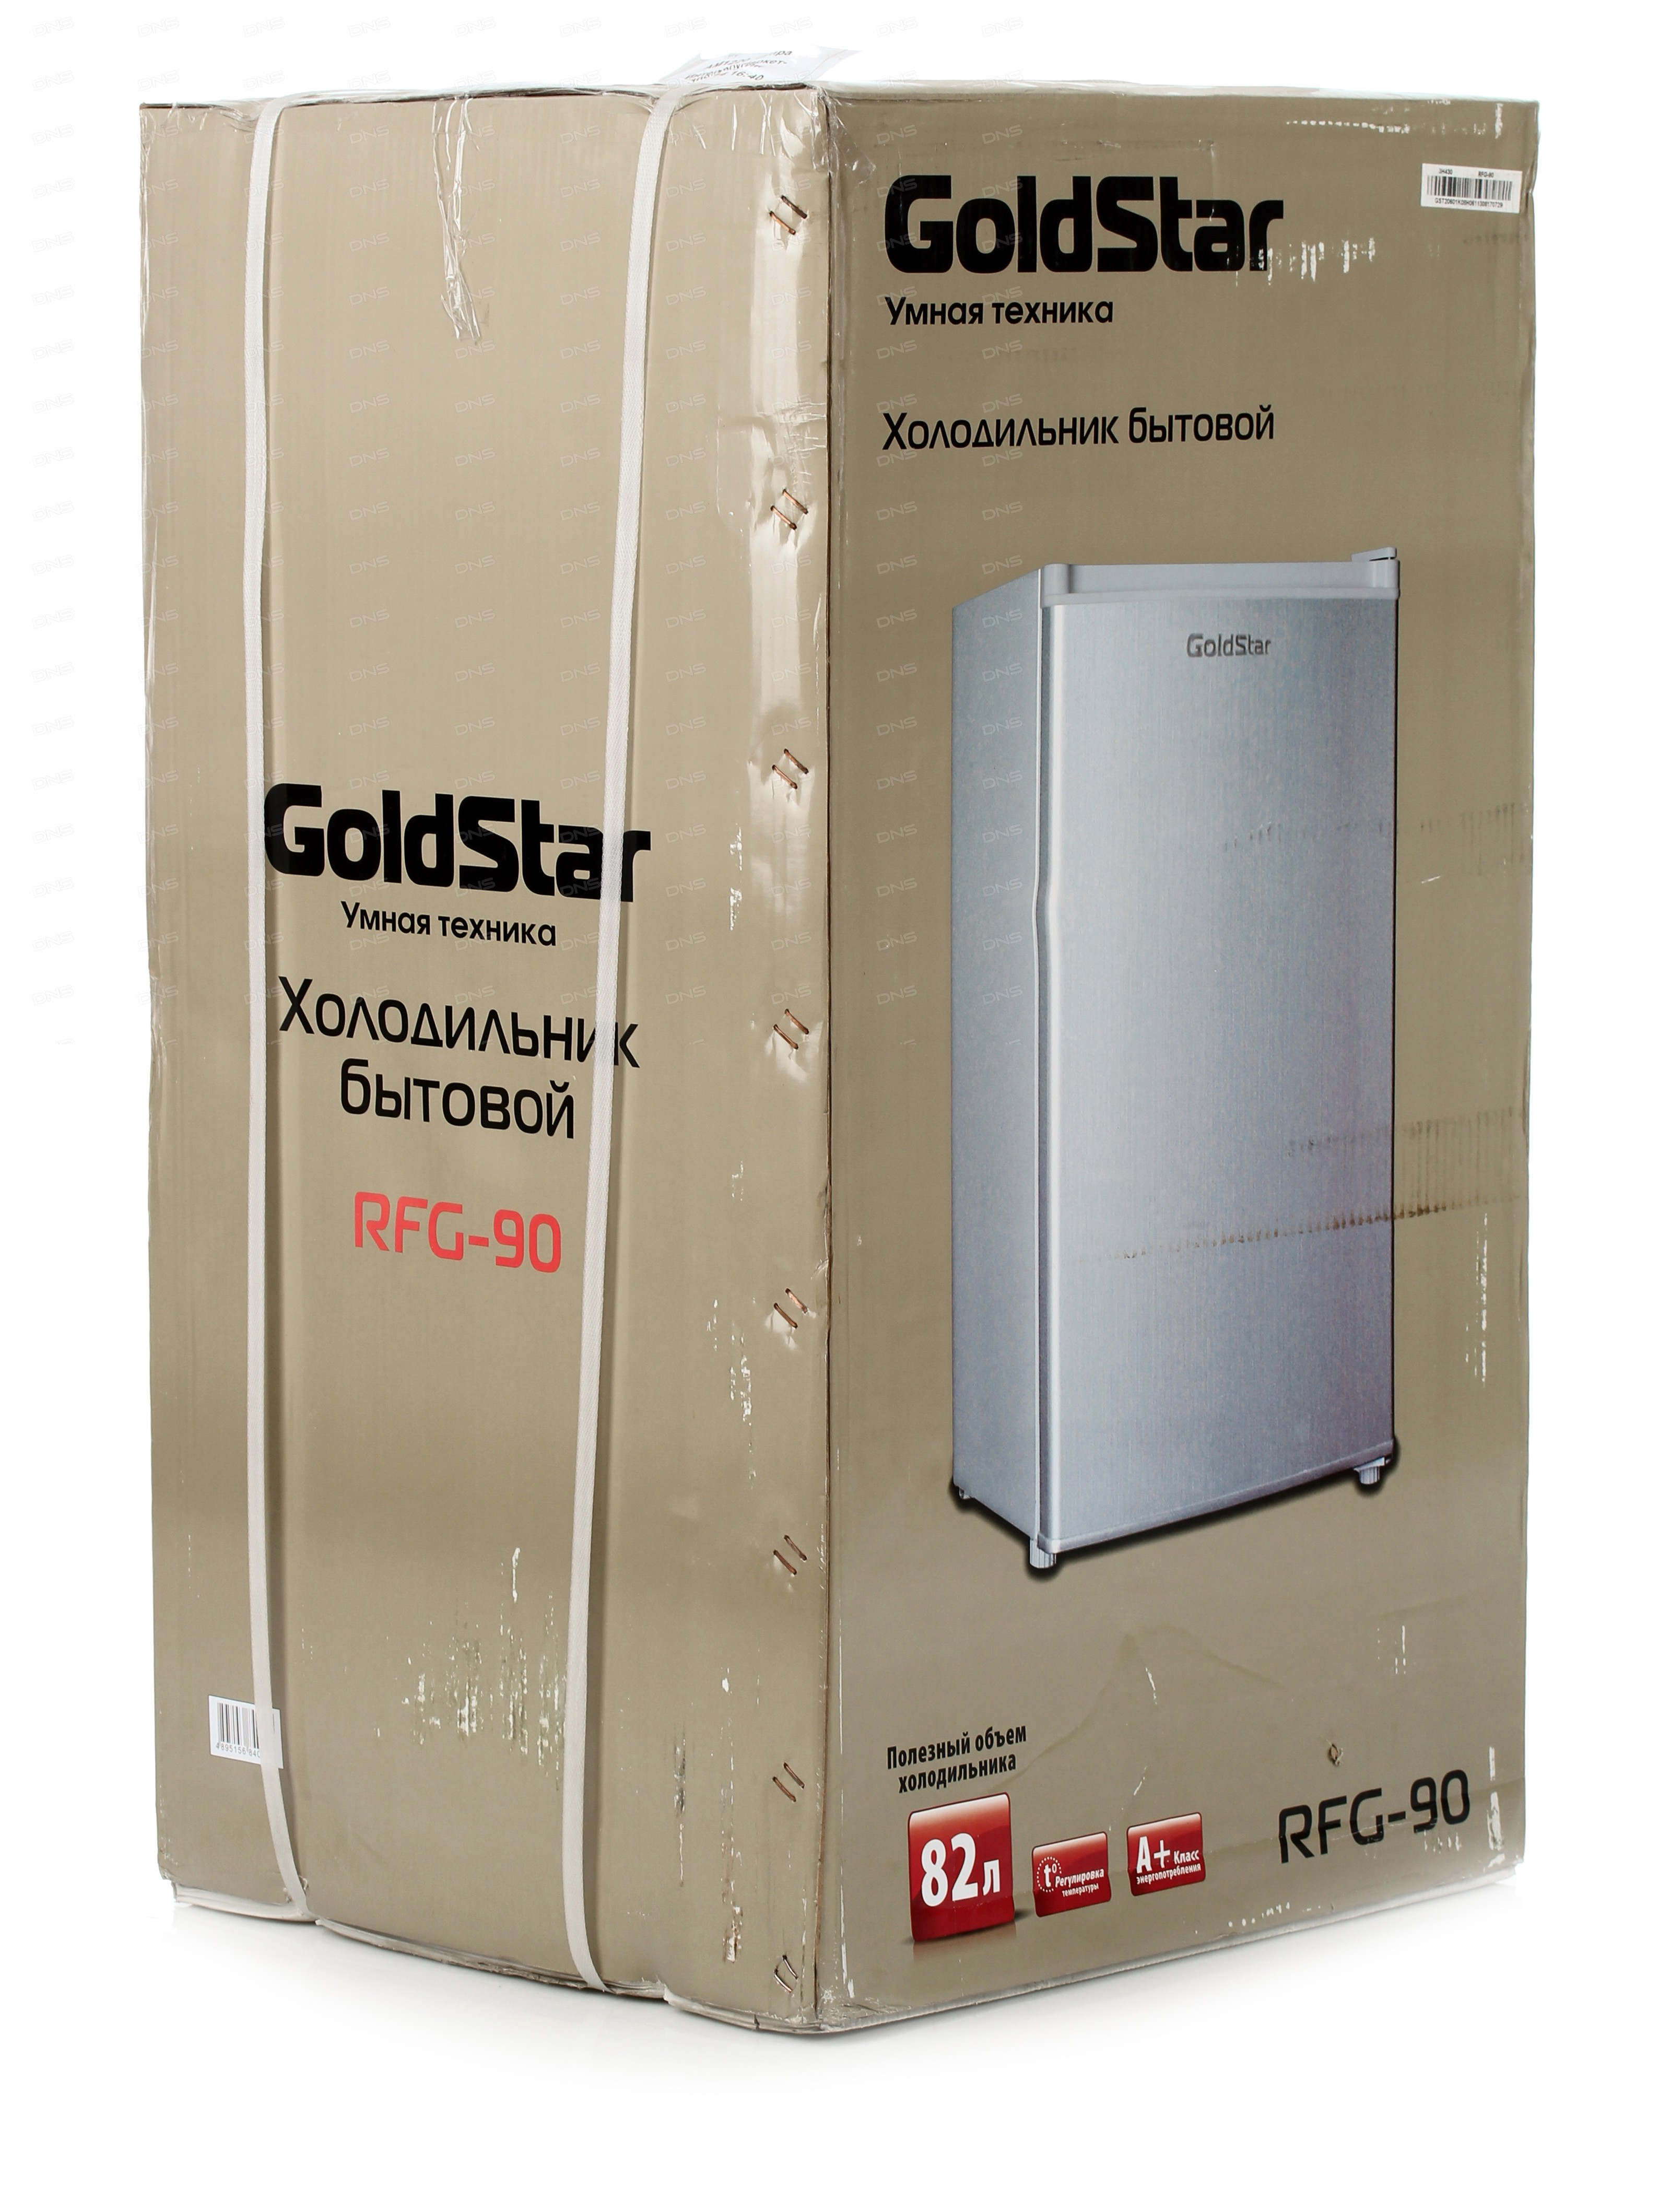 Ремонт холодильников стинол на дому своими руками